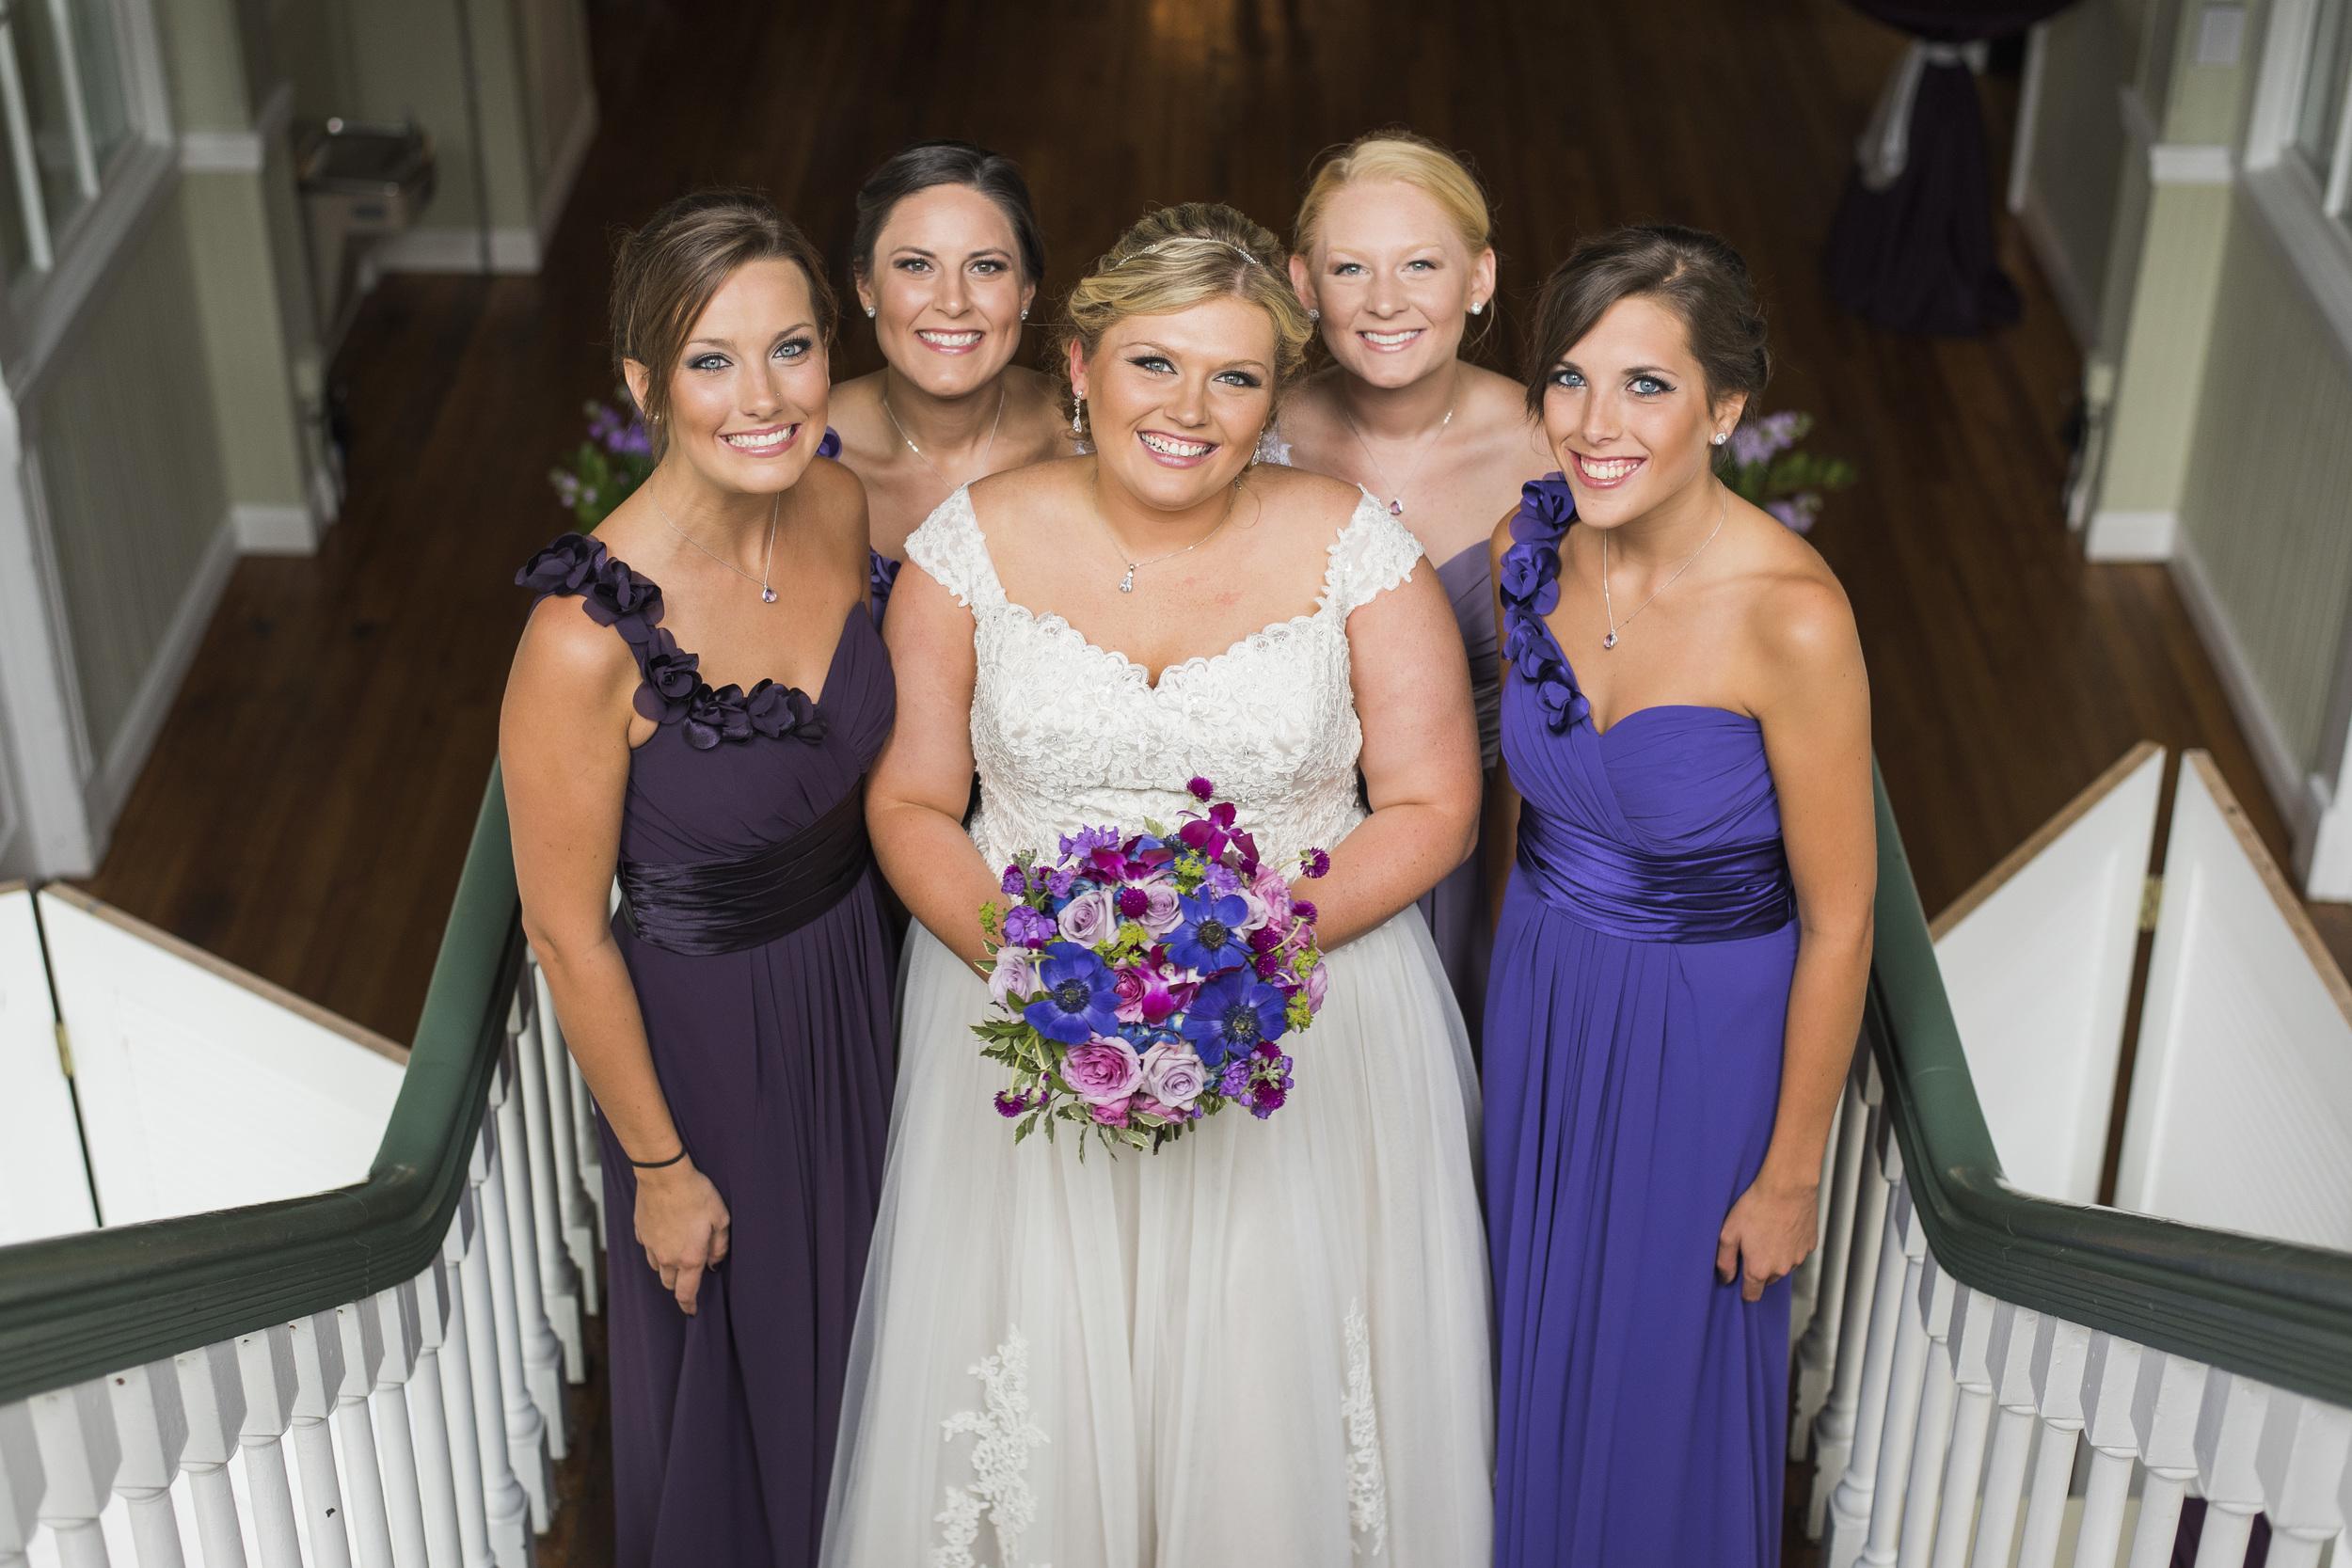 Lynchburg_VA_Wedding_Tresca on 8th_Downtown_Purple_elegant_Photos865.jpg